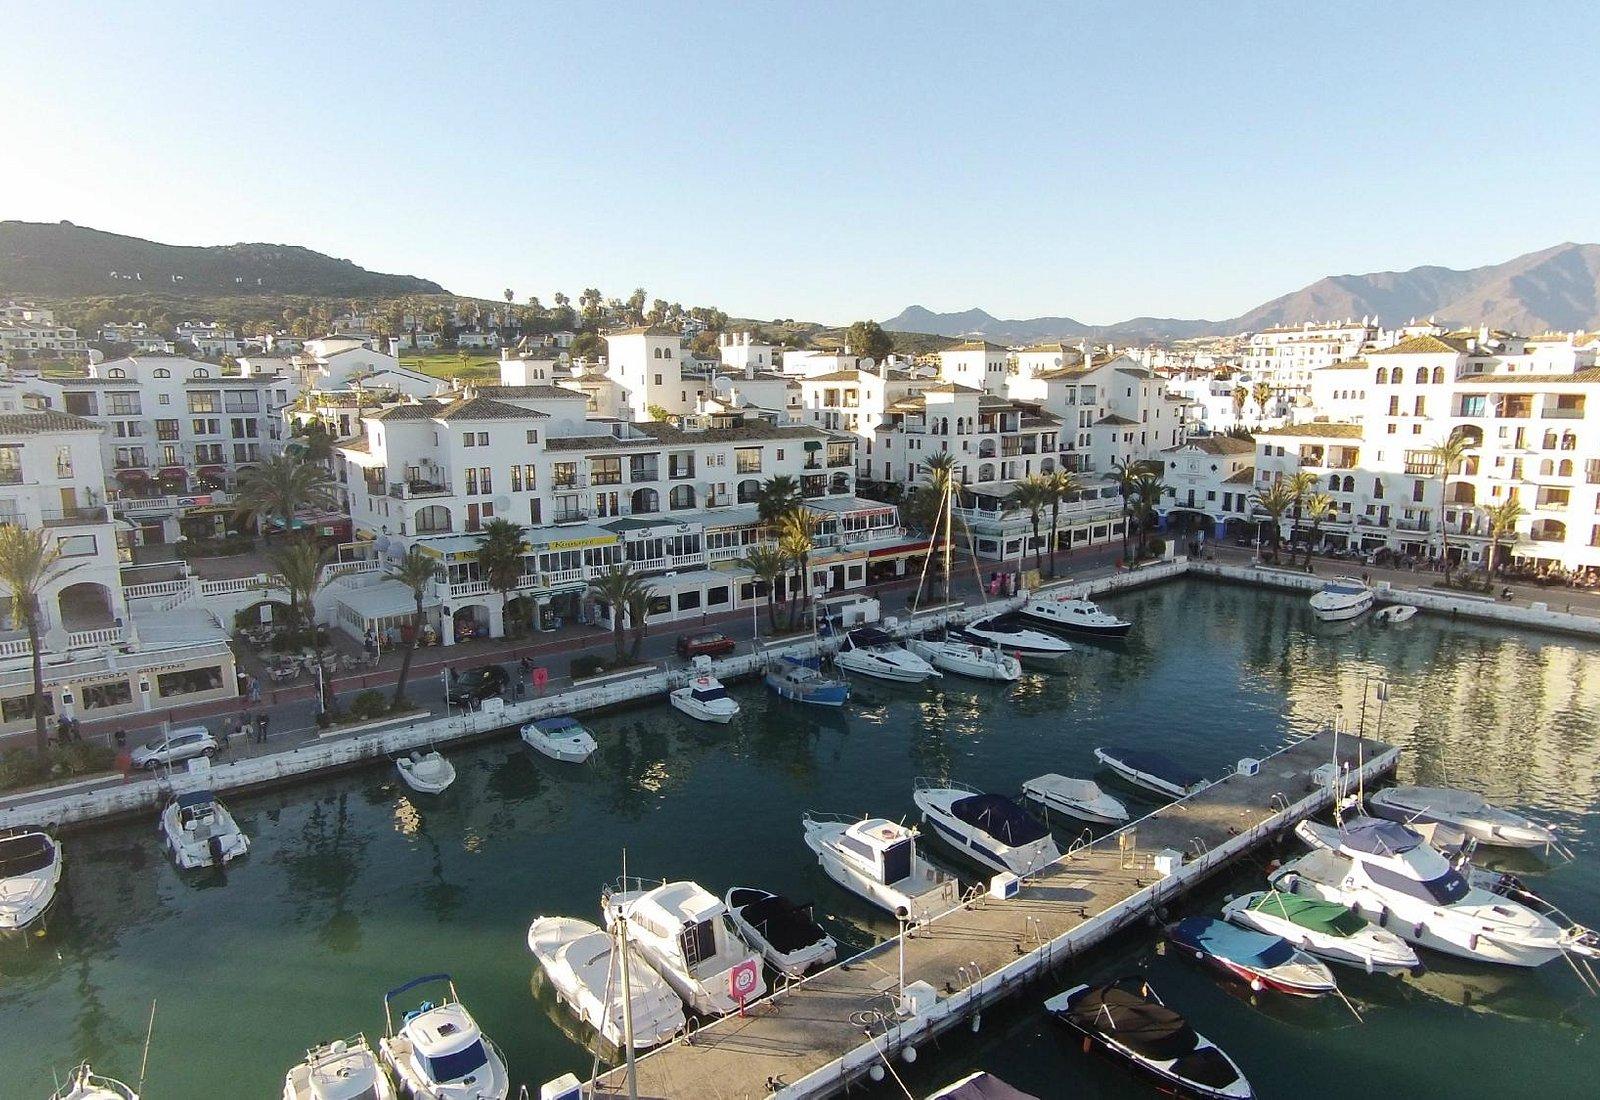 Aerial picture of Puerto de la Duquesa, Manilva, Malaga, Costa del Sol